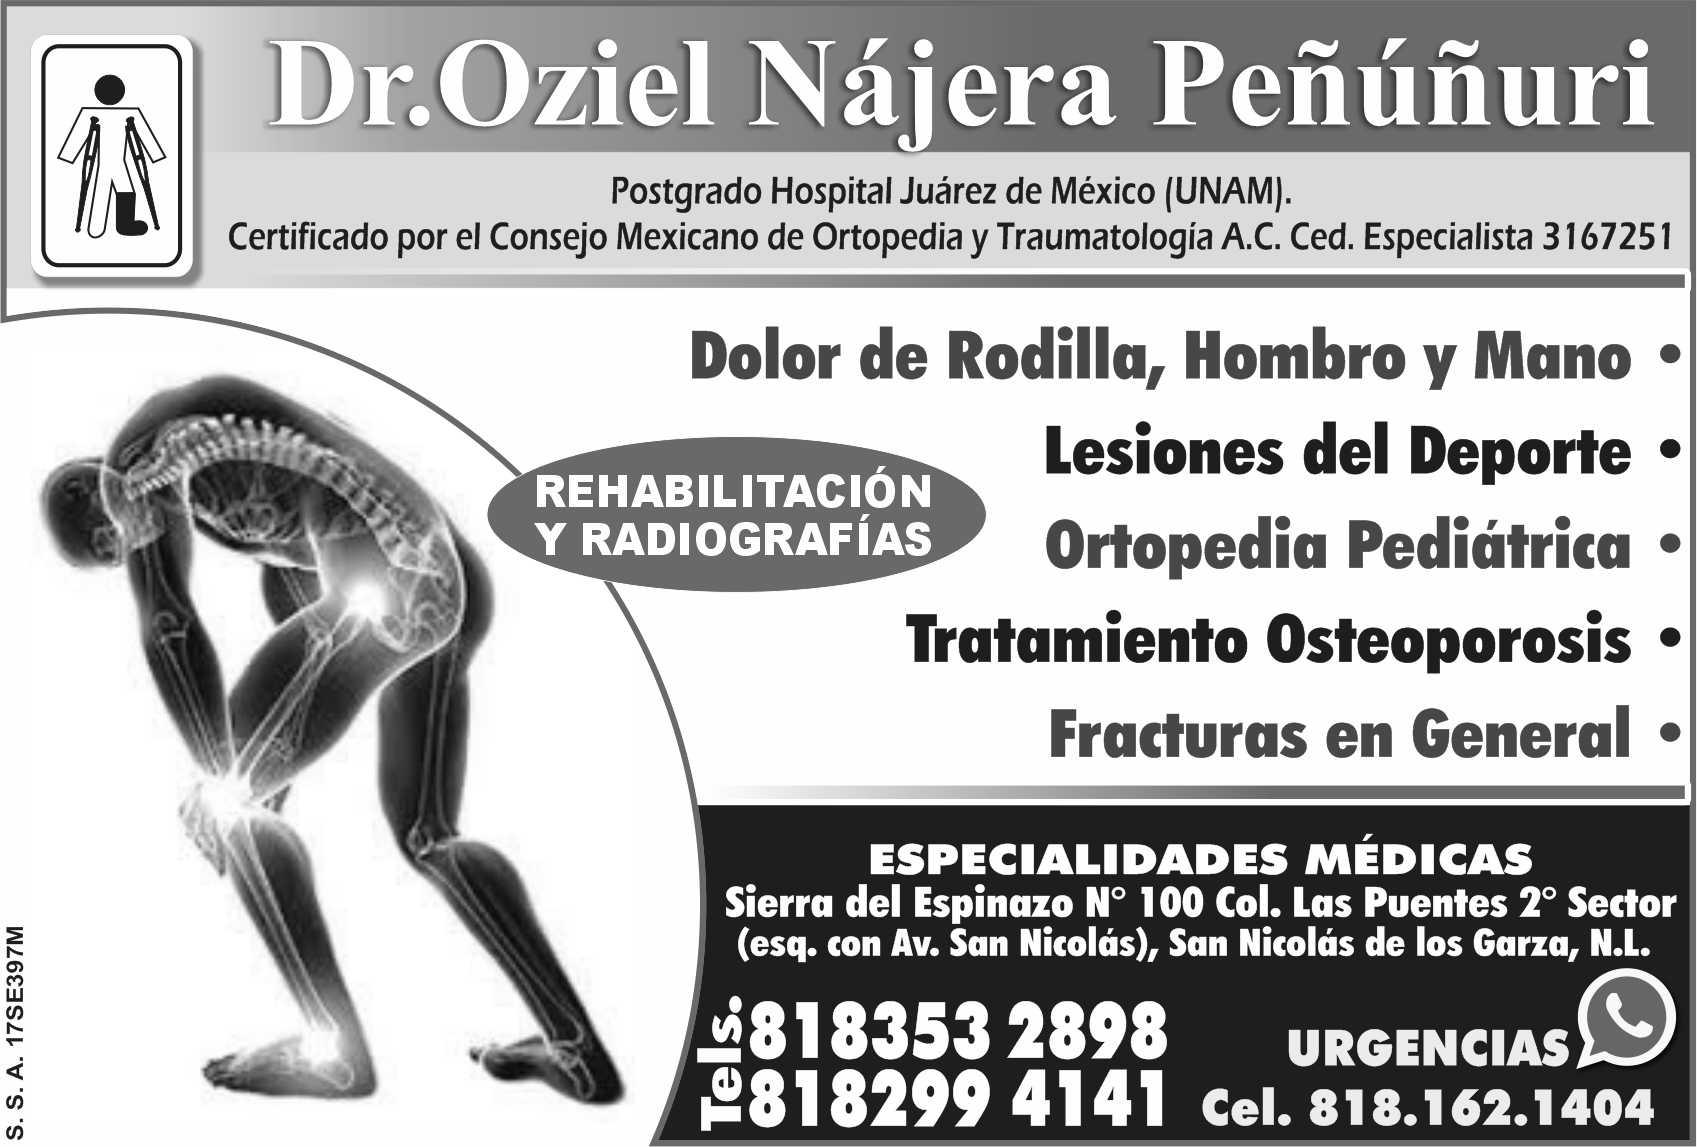 Dr OZIEL NAJERA PENUNURI